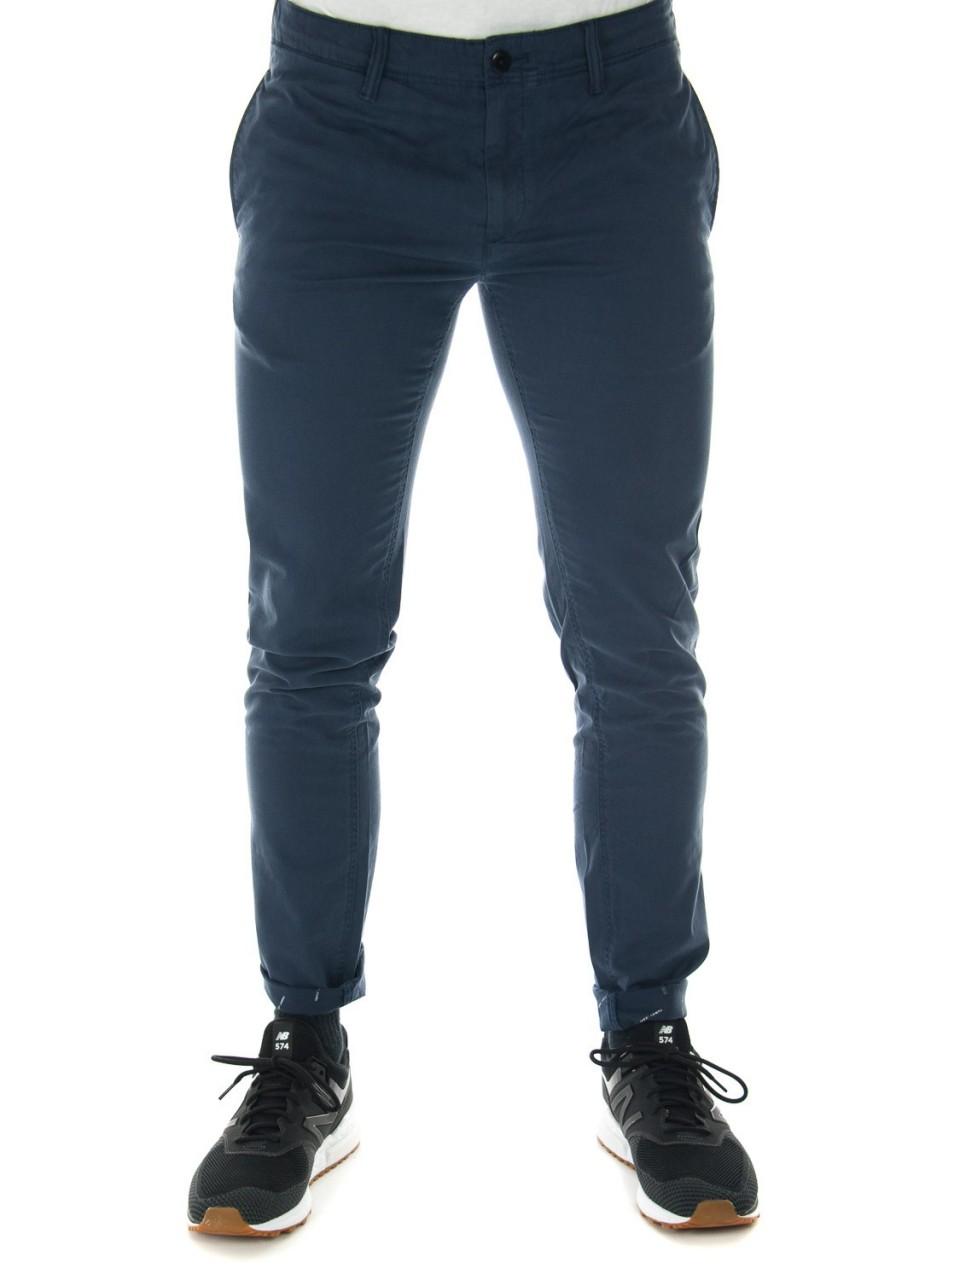 Tommy hilfiger Uomo Pantalone Tommy Hilfiger Uomo Chino 04213H